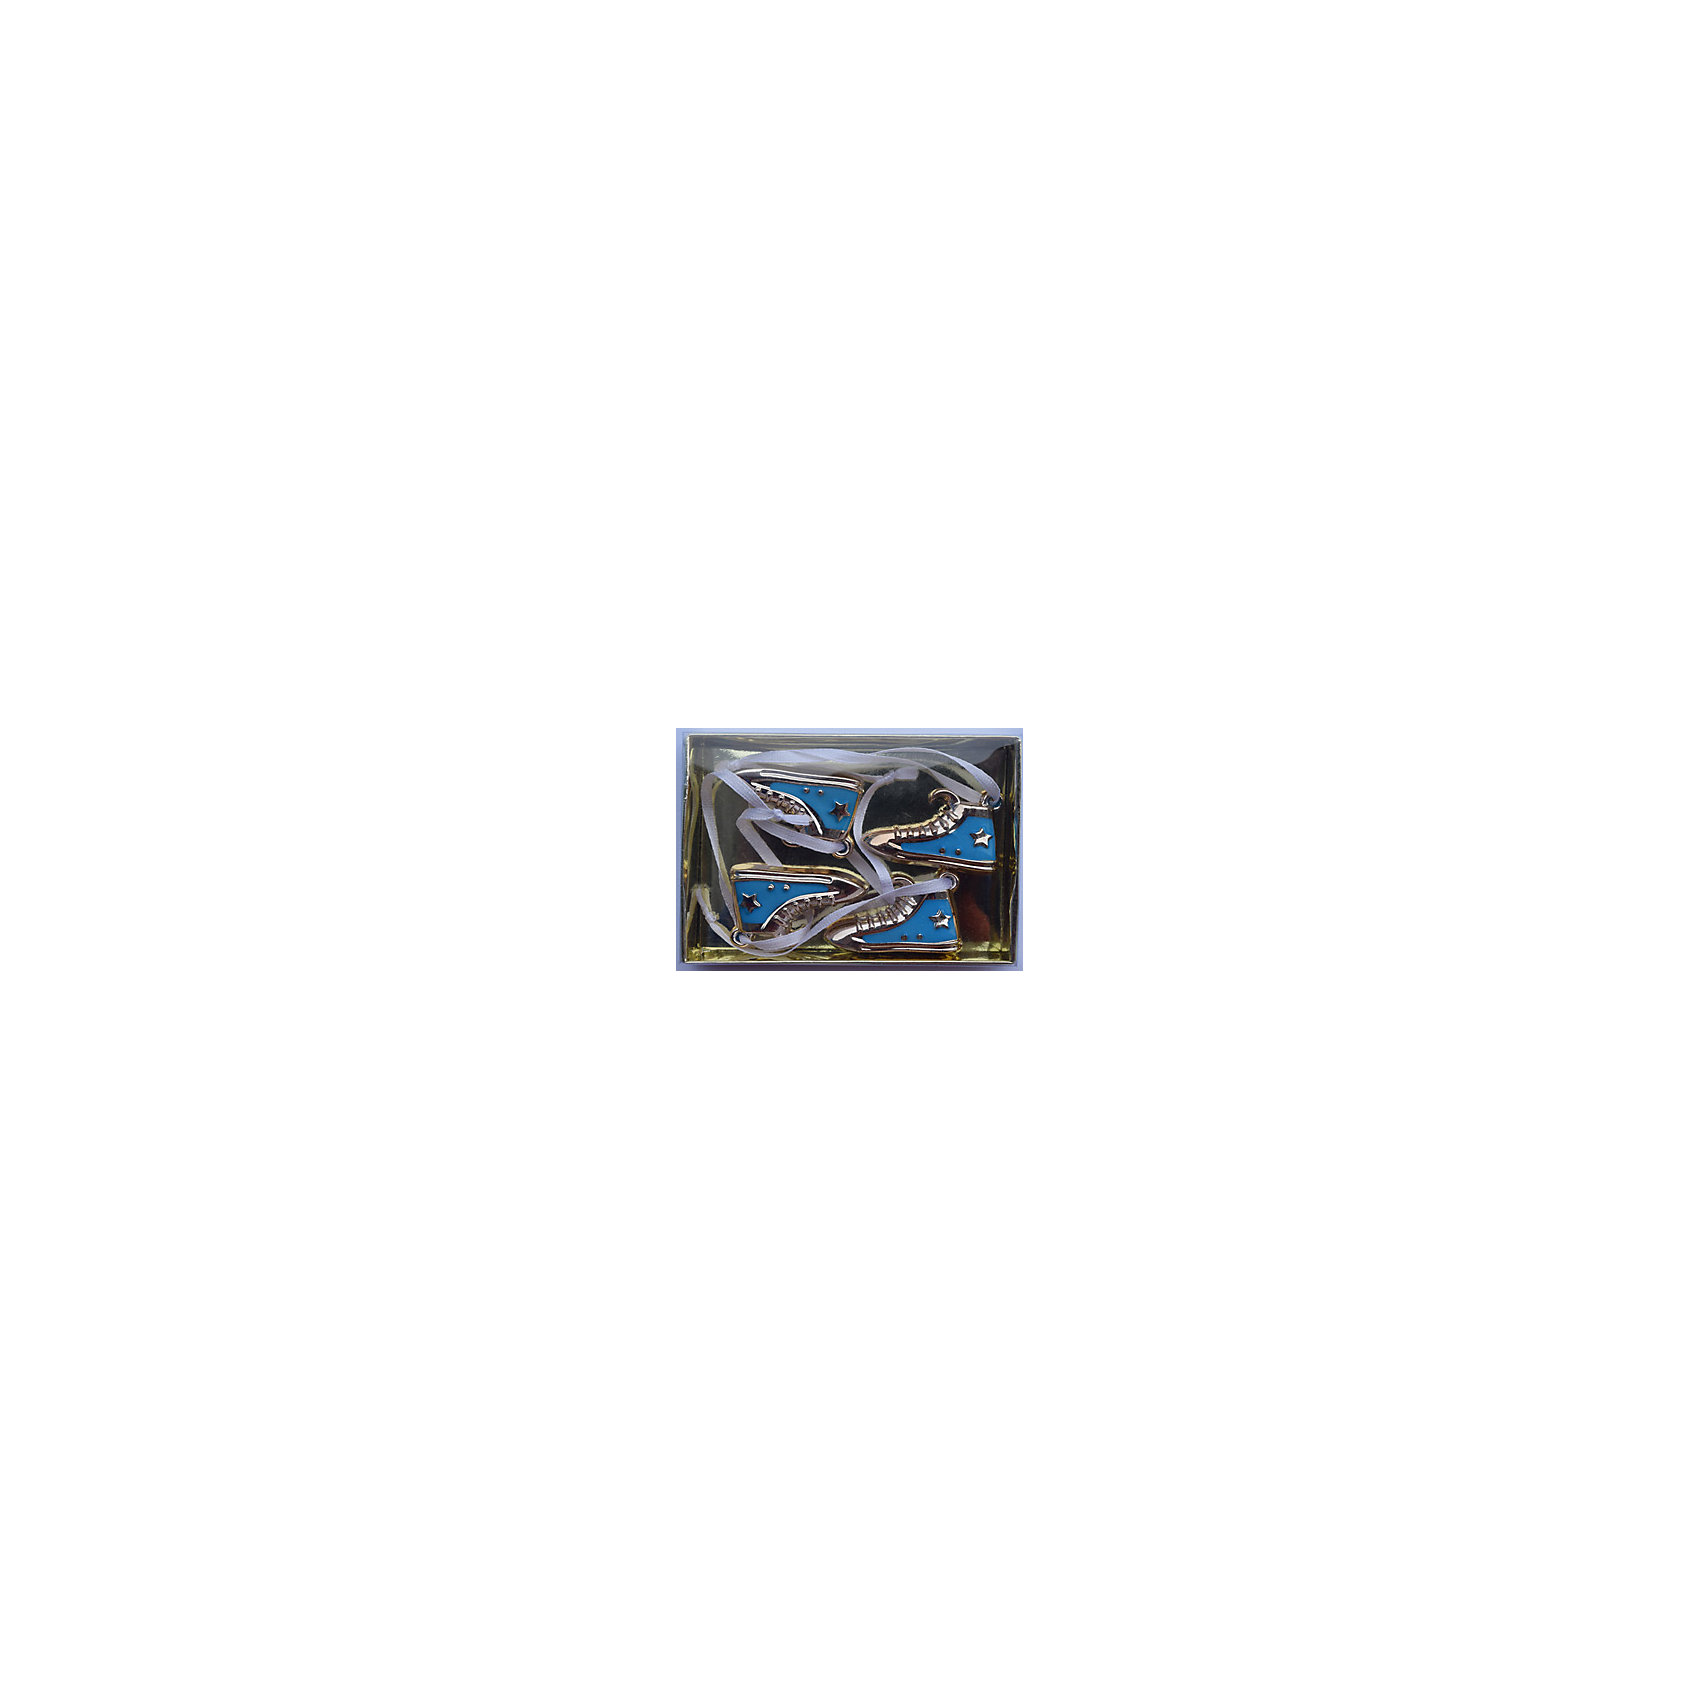 Magic Time Набор украшений Голубые кеды 4 шт magic time набор украшений королевские ключи 2 шт